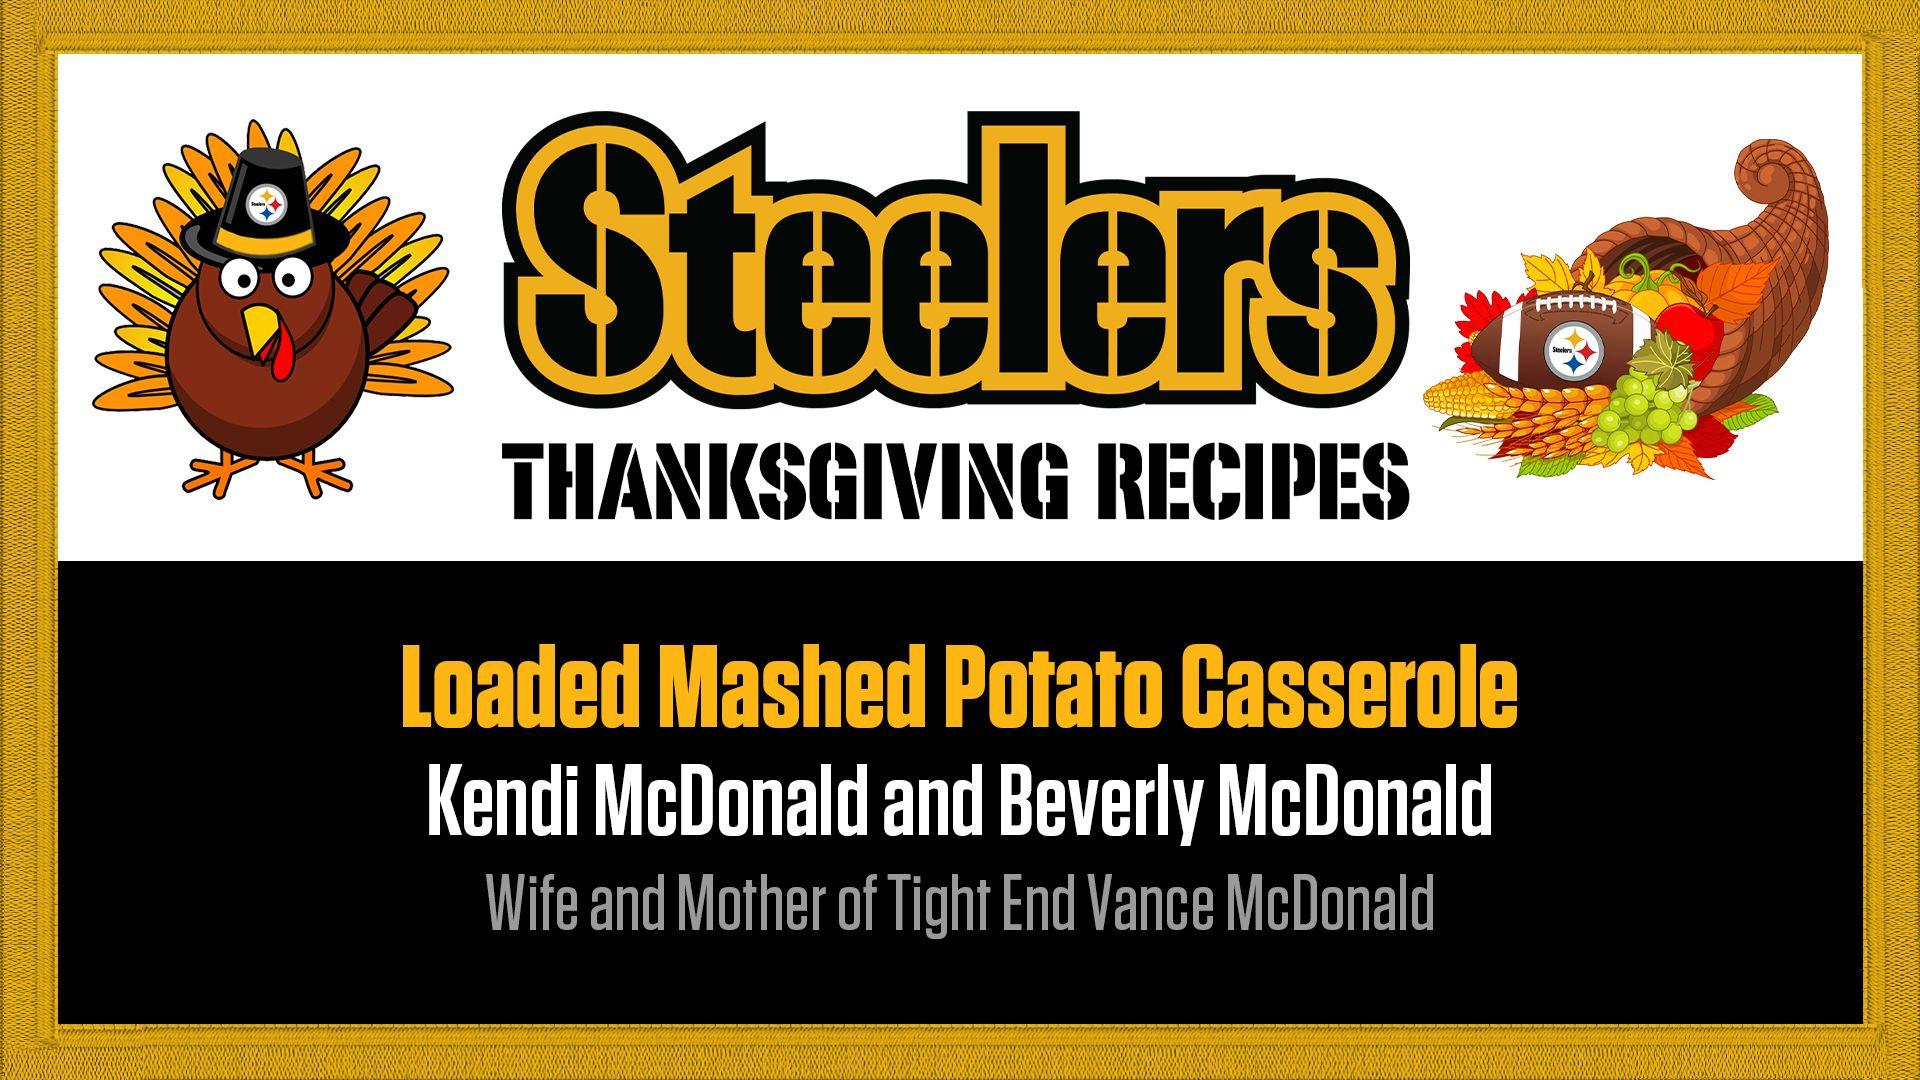 Recipe - loaded mashed potato casserole_the mcdonalds